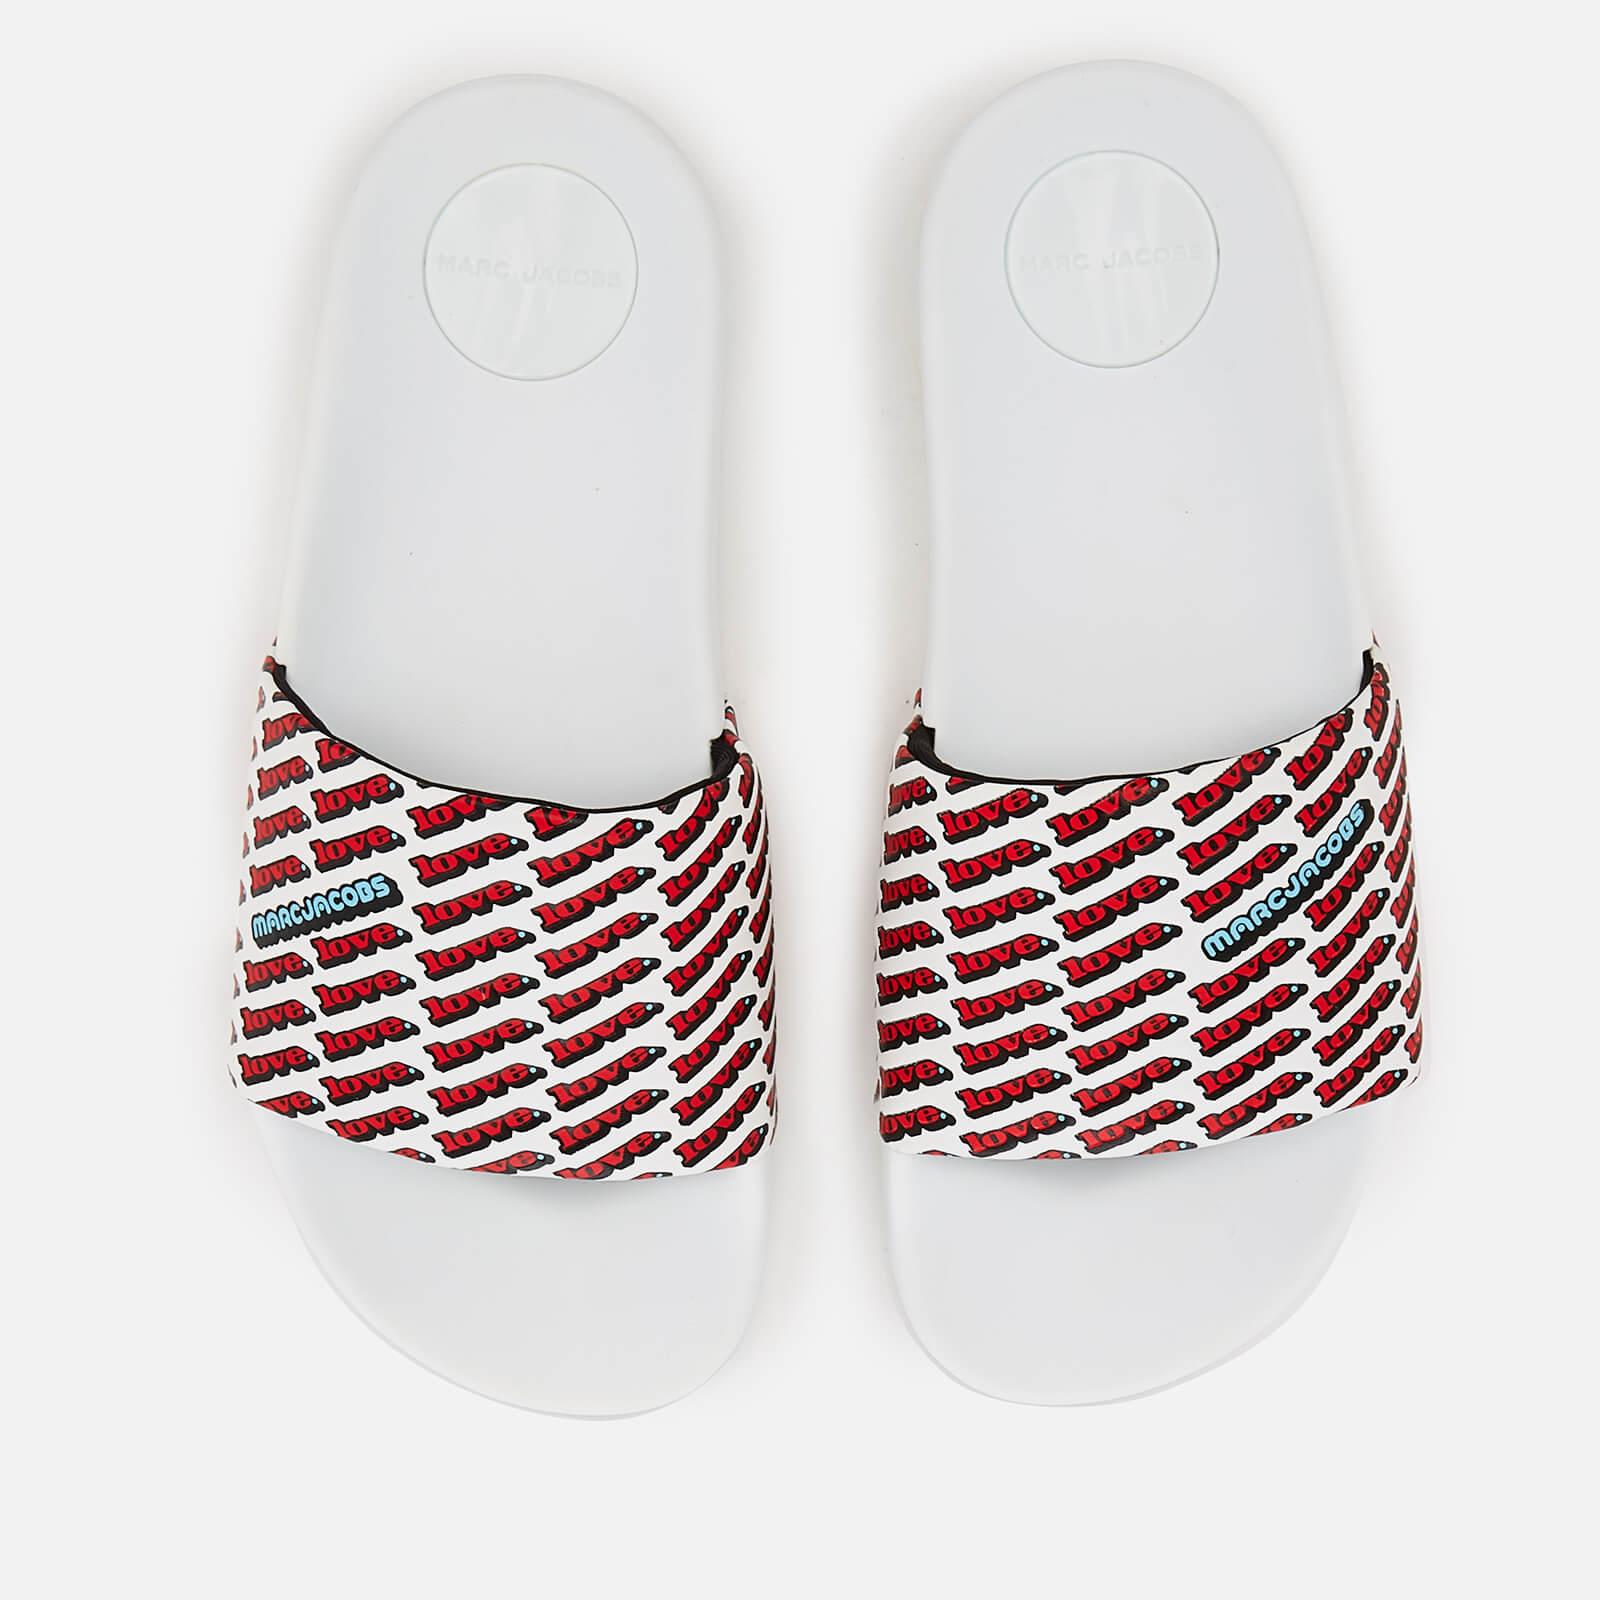 6799da1b31fe46 Marc Jacobs Women s Love Aqua Slide Sandals - White Multi - Free UK  Delivery over £50